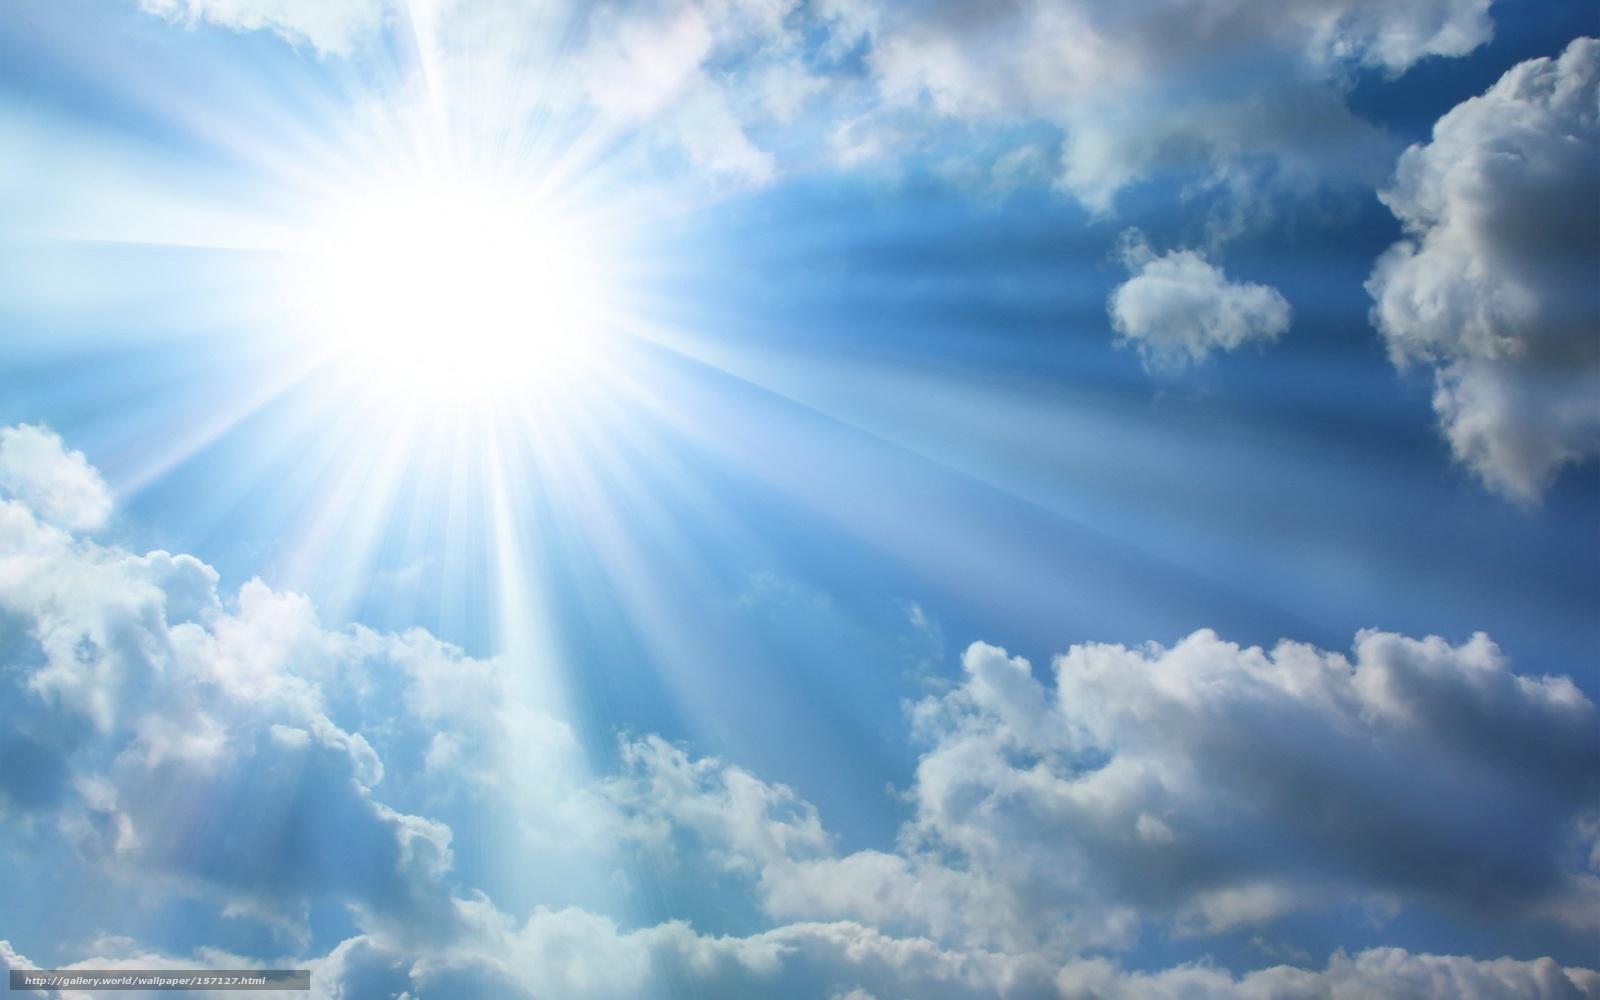 небо, солнце, облака, лучи